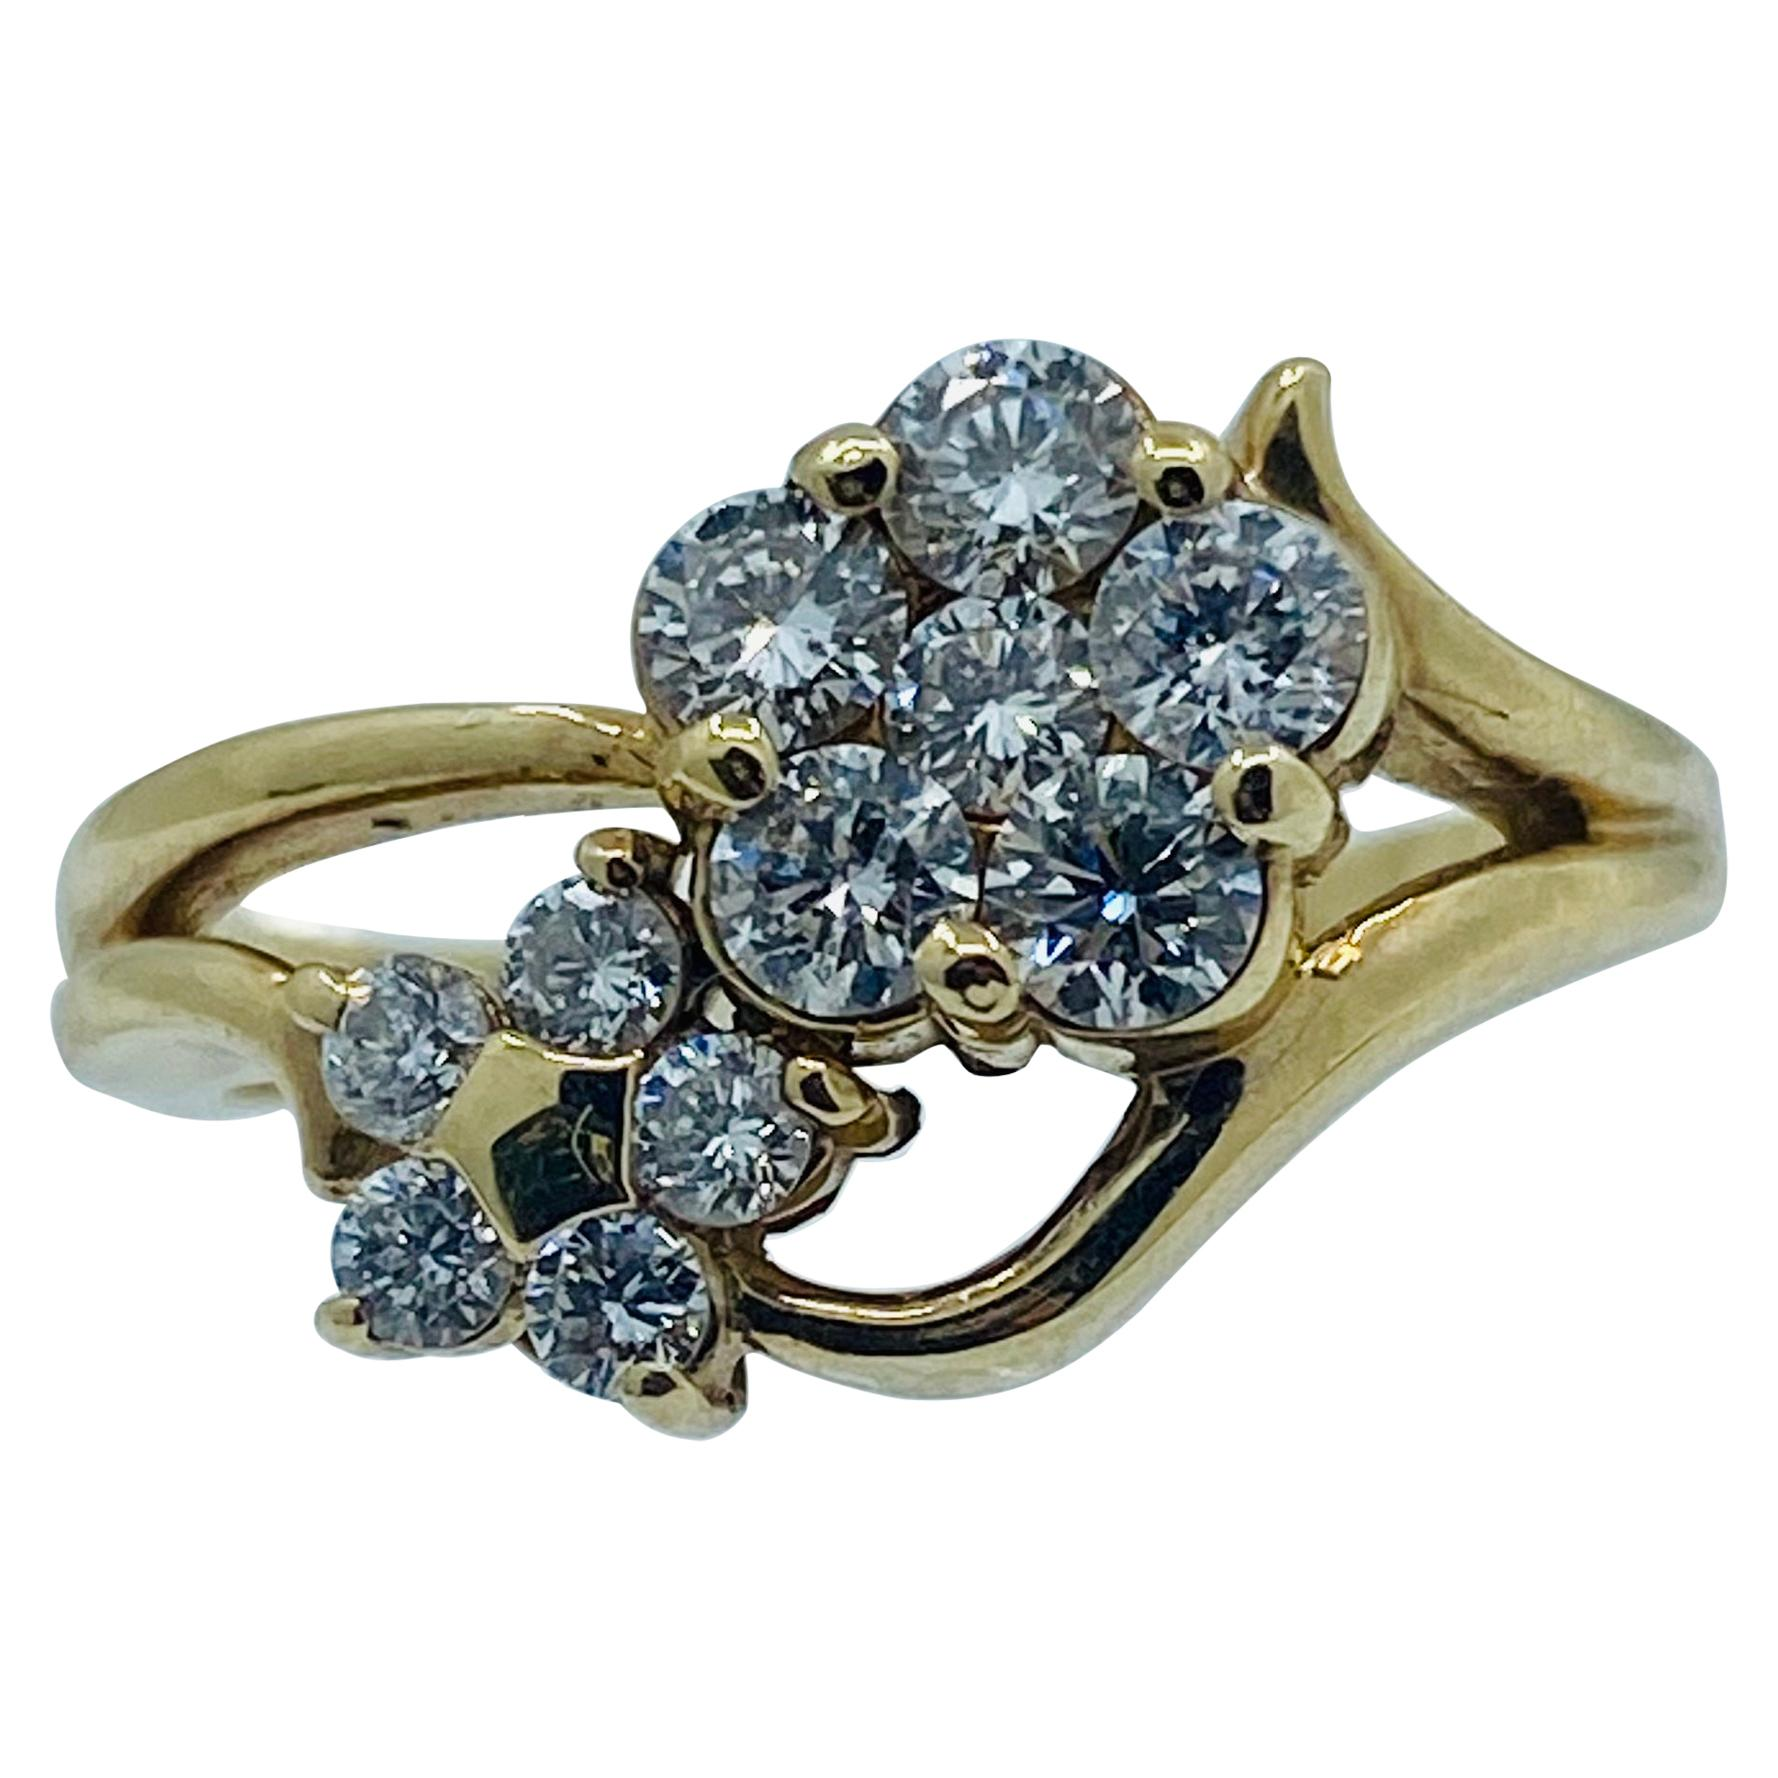 1.35 Carat Diamond Double Flower 18 Karat Yellow Gold Cluster Ring